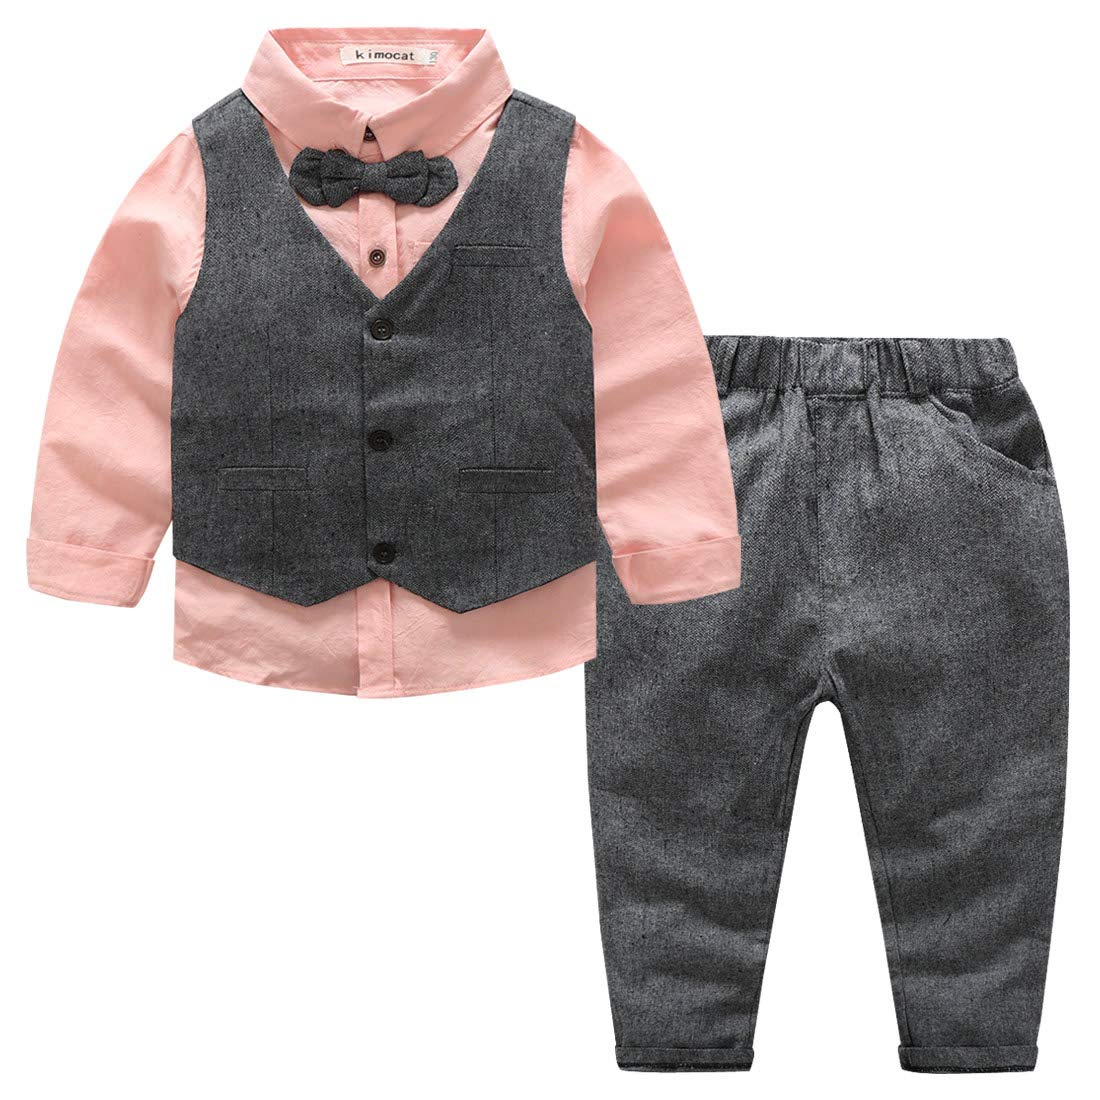 Little Boys 3pcs Formal Clothing Set Cotton Breathable Wedding Outfits Classic Gentle Tuxedo Suit, 4T